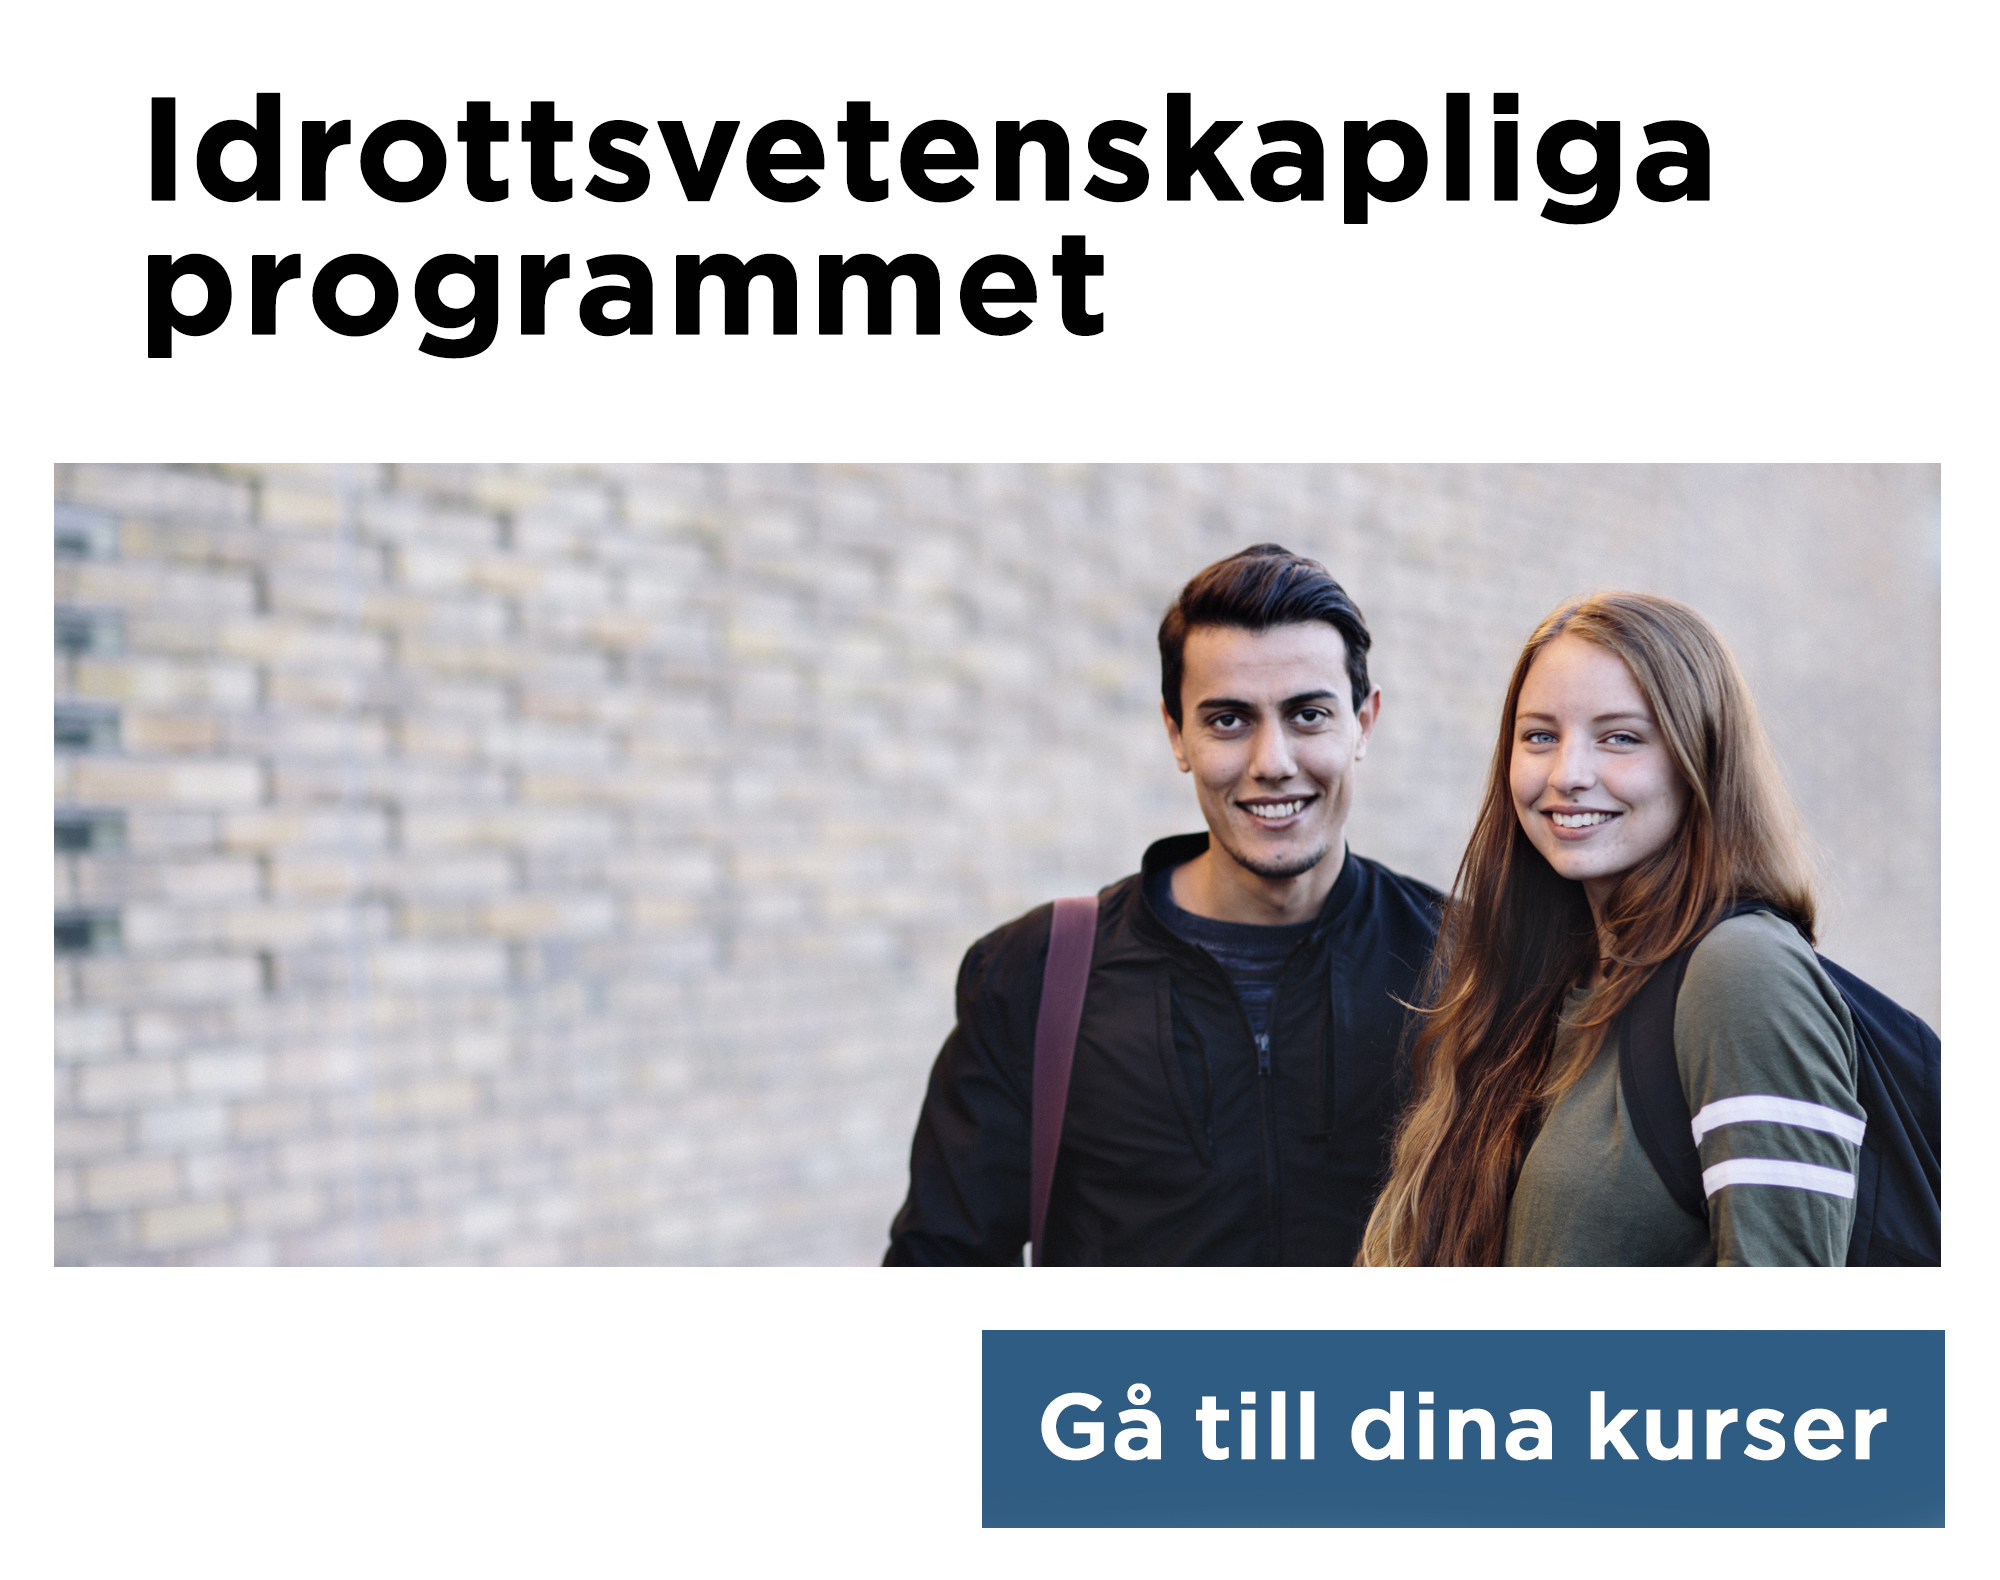 Idrottsvetenskapliga programmet